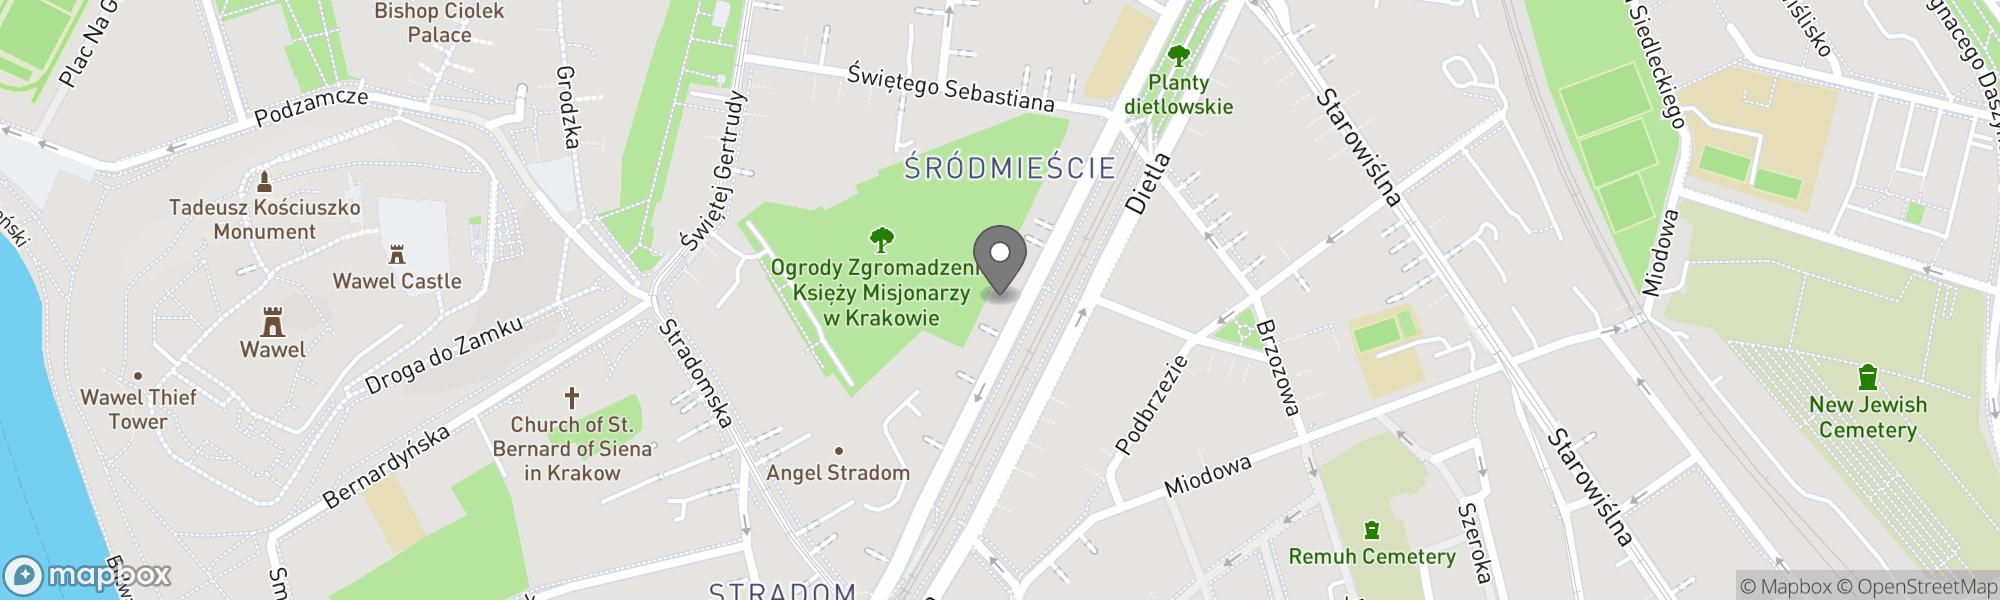 Map of Krakow area